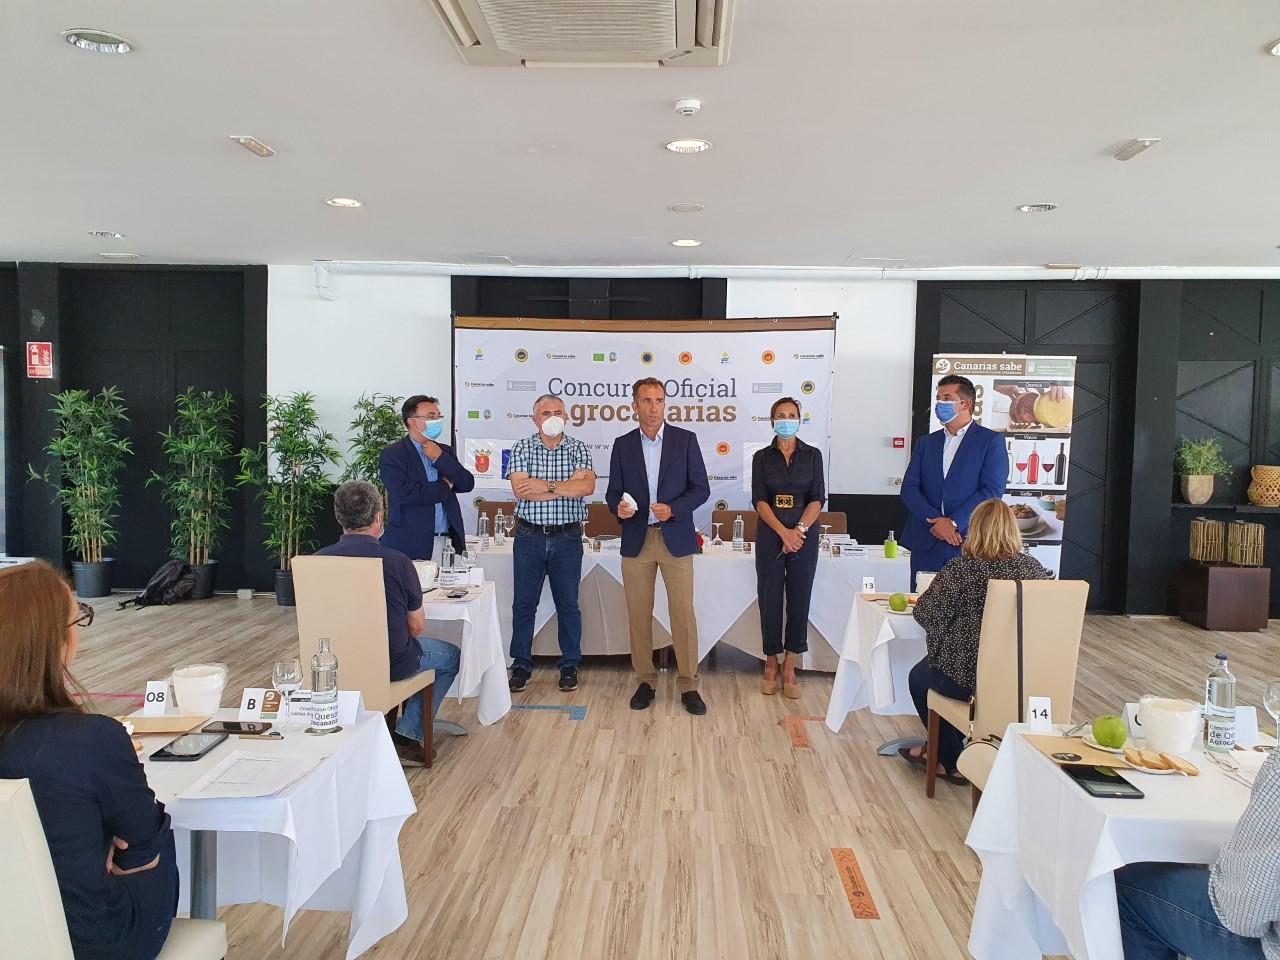 Concurso Oficial de Quesos Agrocanarias 2020